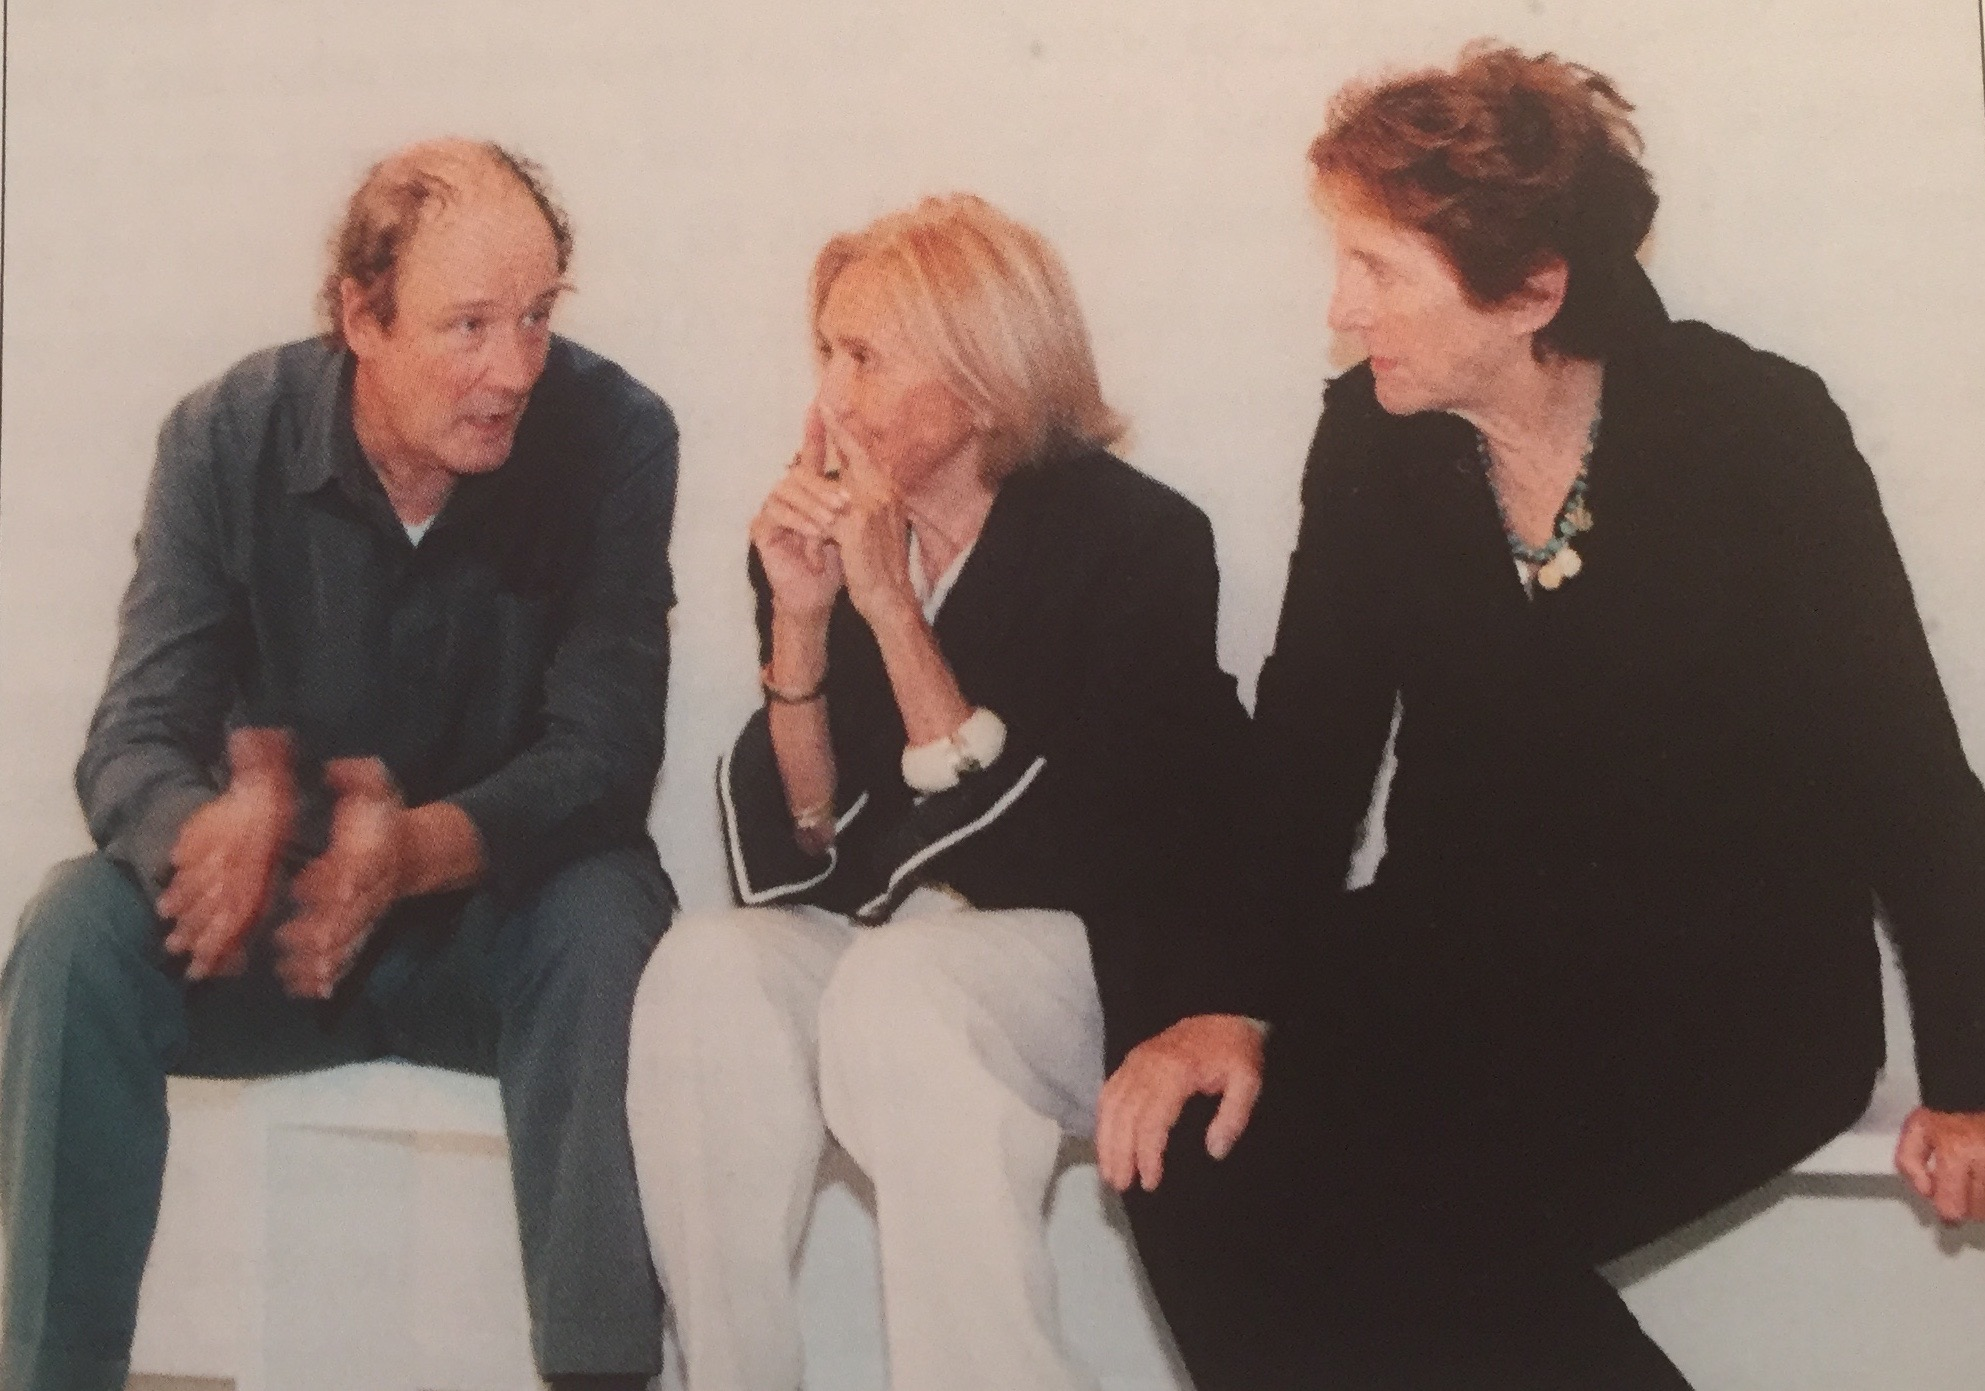 David Tremlett, Marilena e Silvana Bonomo in galleria a Bari, 2002.